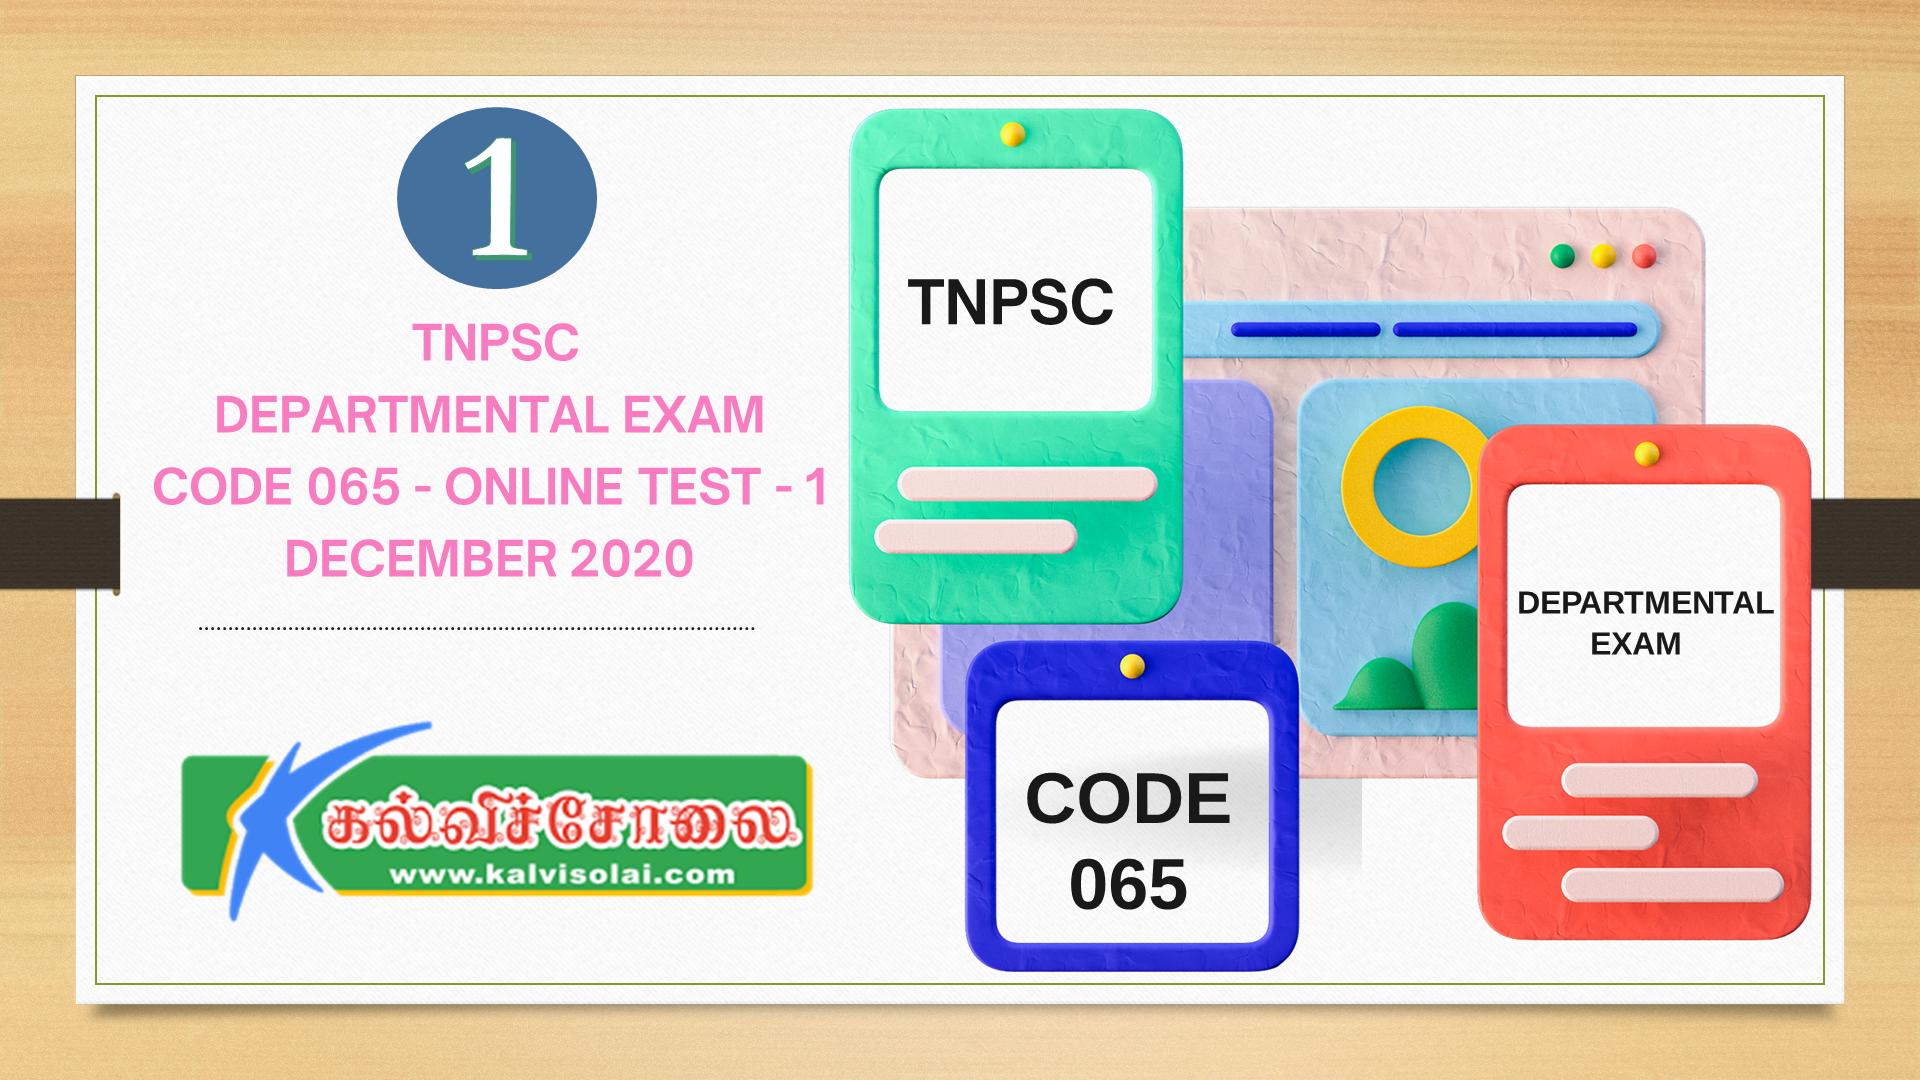 kalvisolai-kalviseihi-padasalai-kalvikural-kaninikkalvi-TNPSC DEPARTMENTAL EXAM - CODE 065 - ONLINE TEST - 1